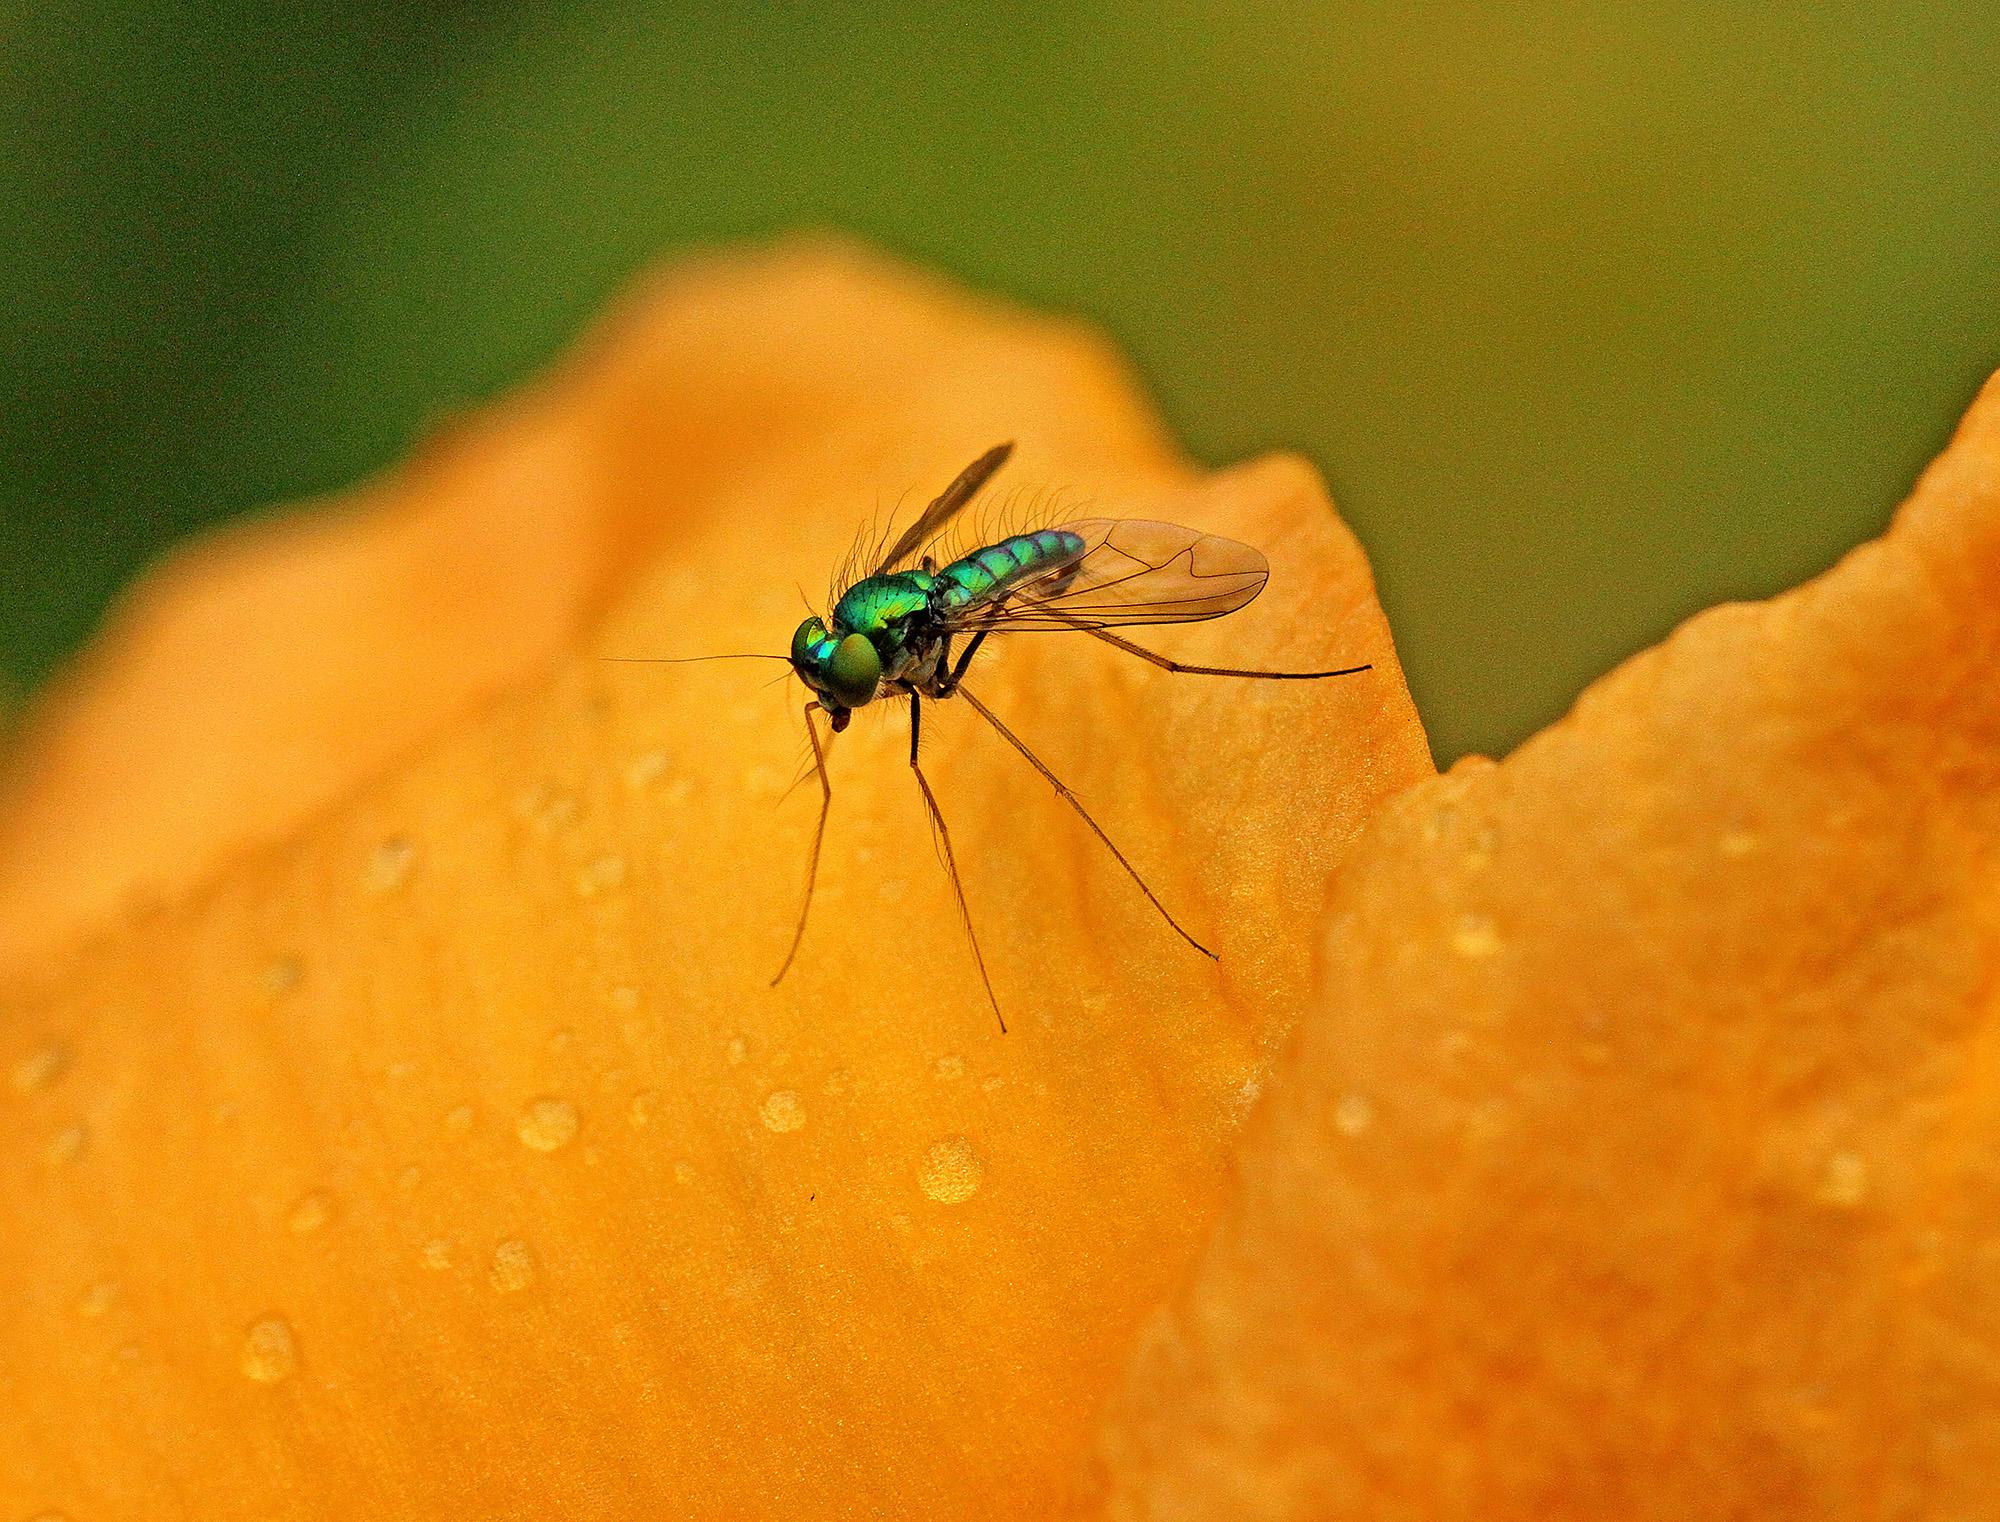 A Friendly Fly